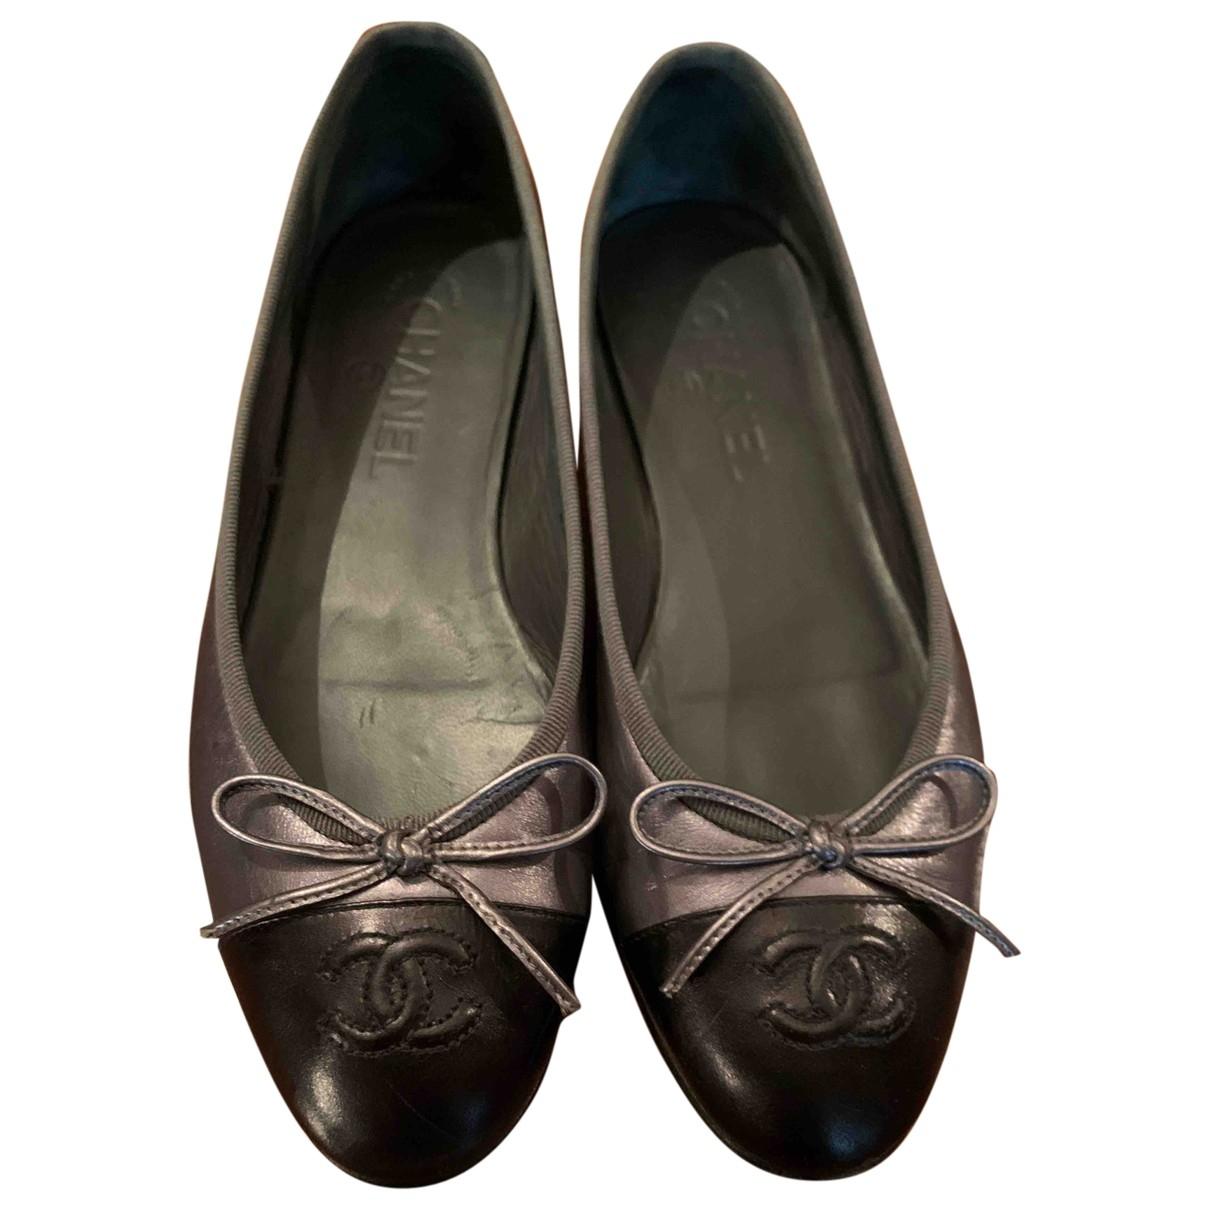 Chanel \N Metallic Leather Ballet flats for Women 37.5 EU